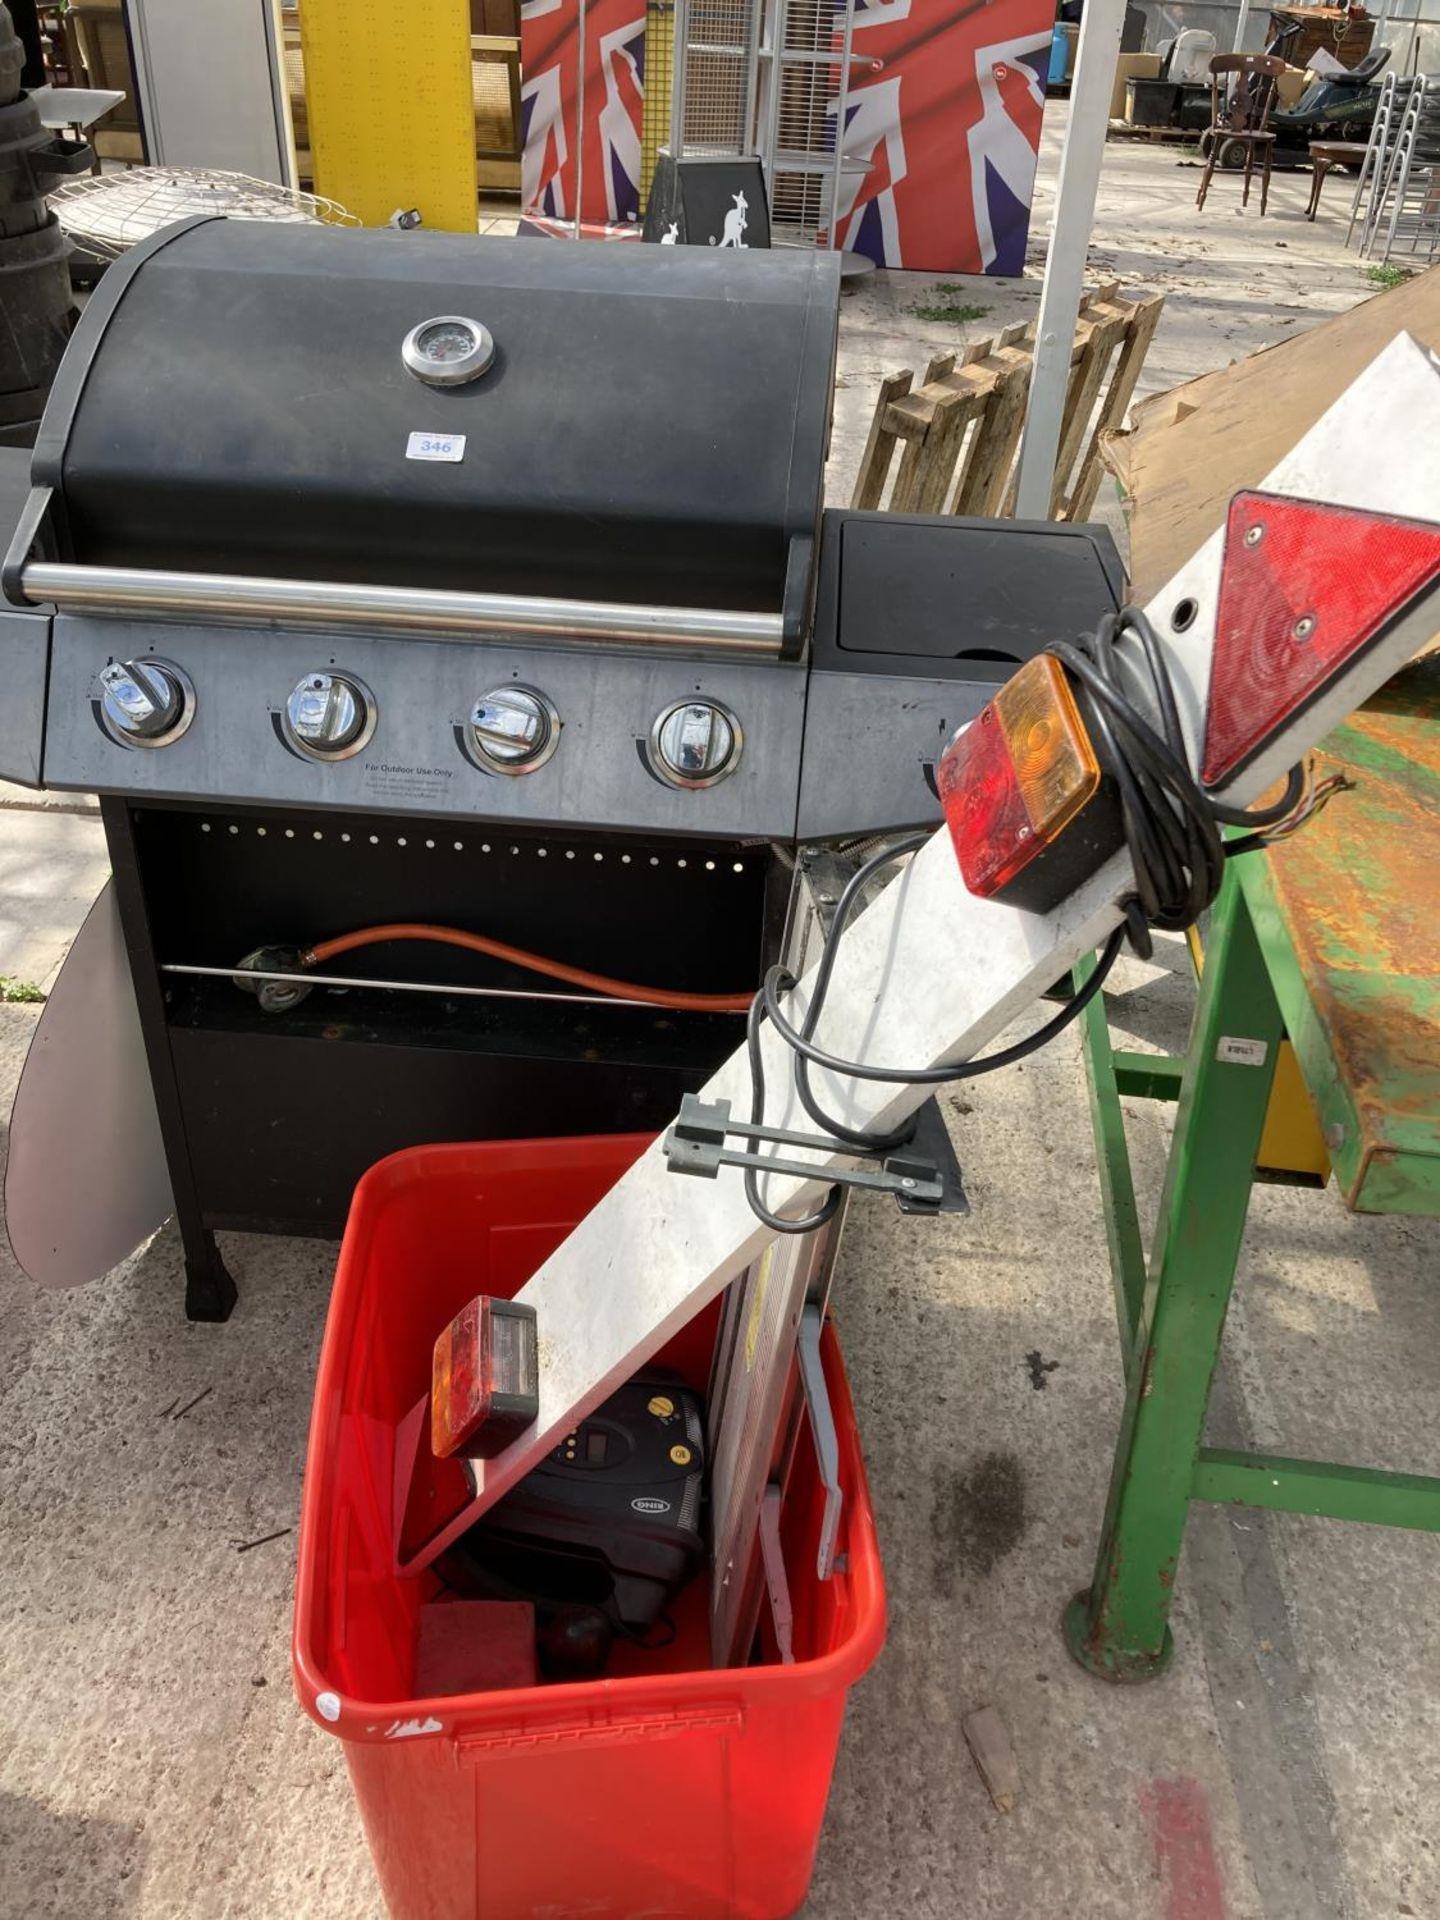 A GAS BBQ, LIGHTBOARD ETC NO VAT